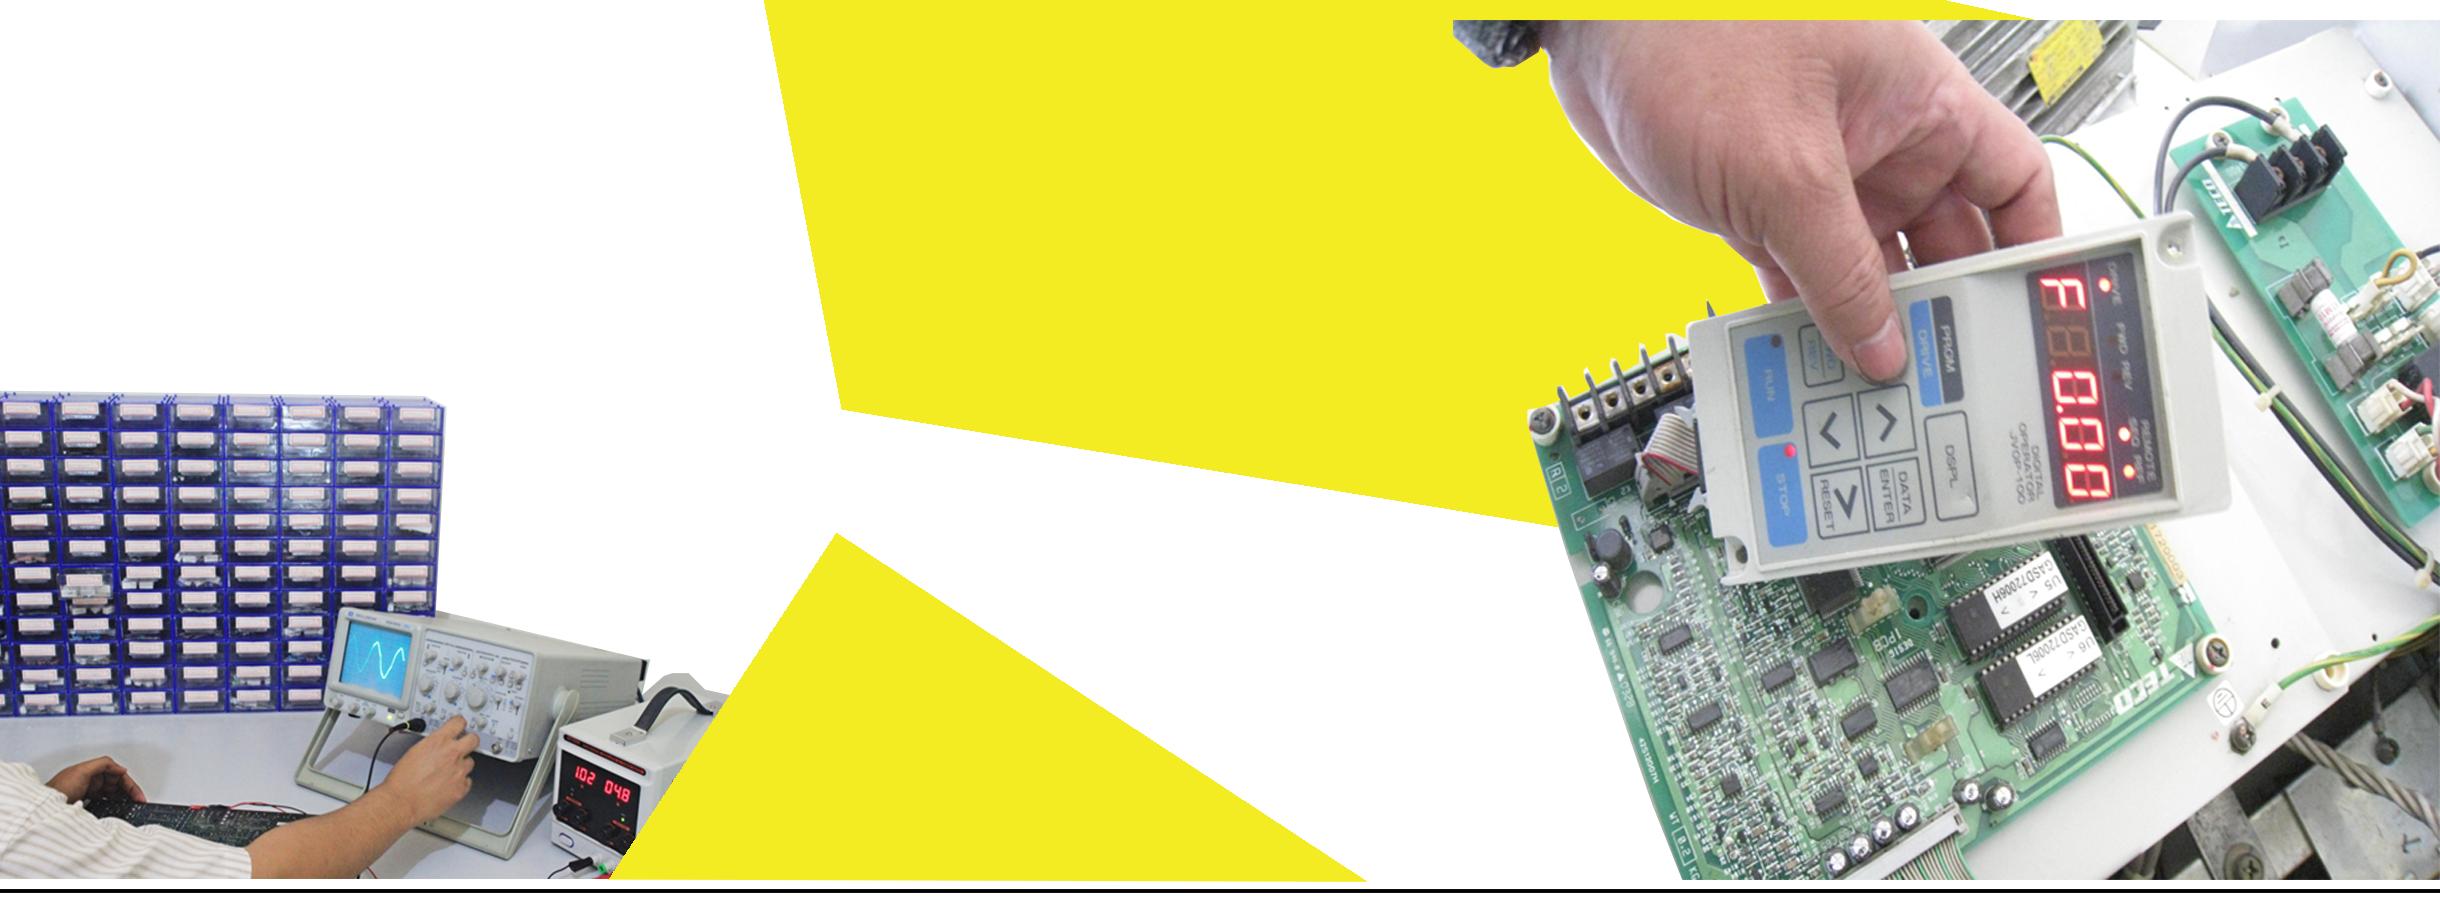 industrial-elektronik-repair